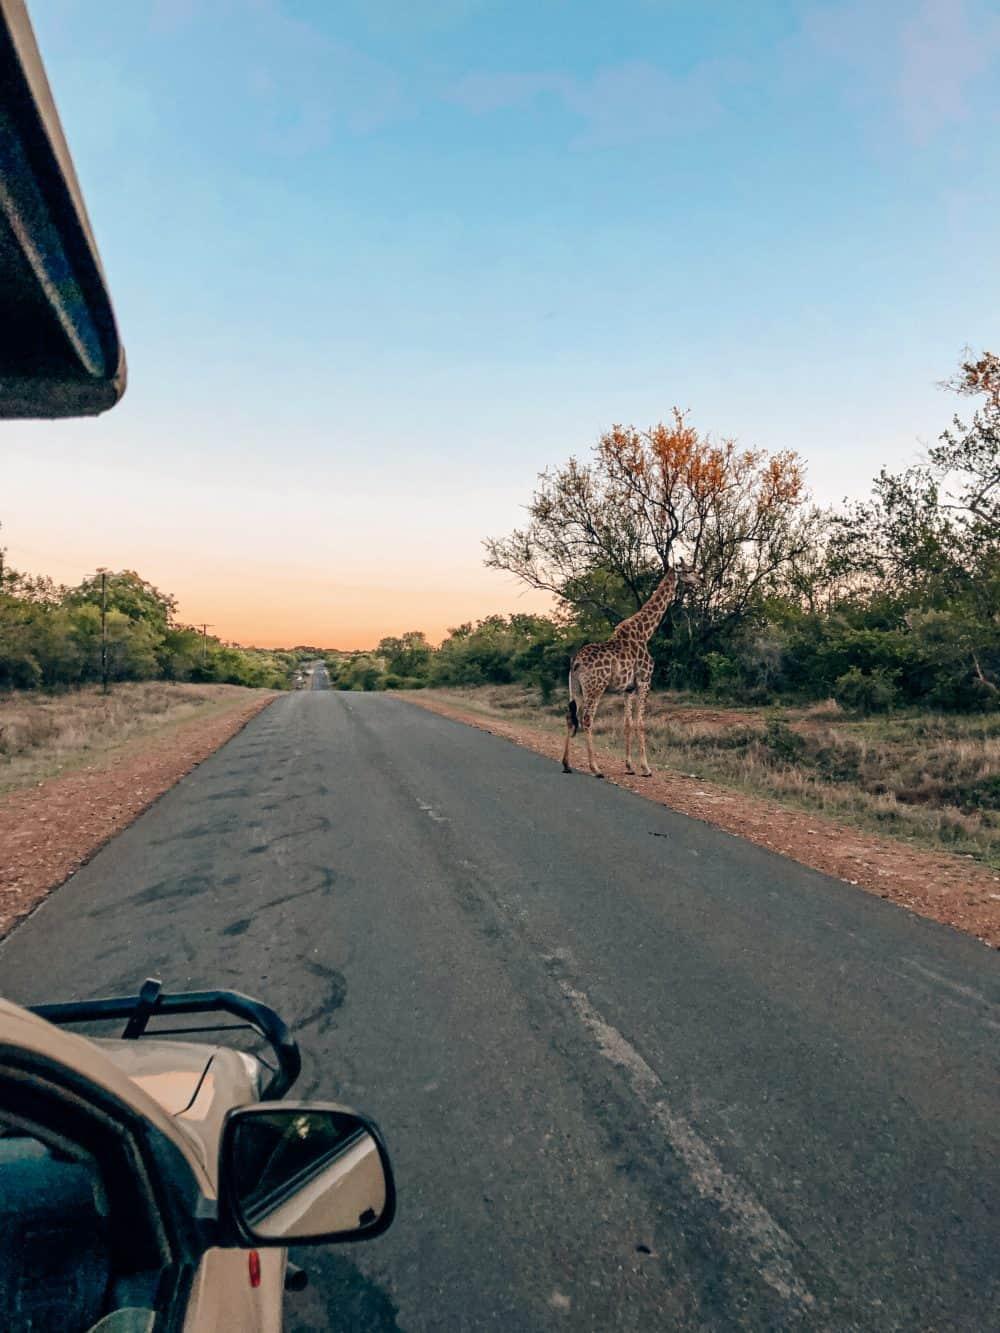 animal sightings at Kruger National Park